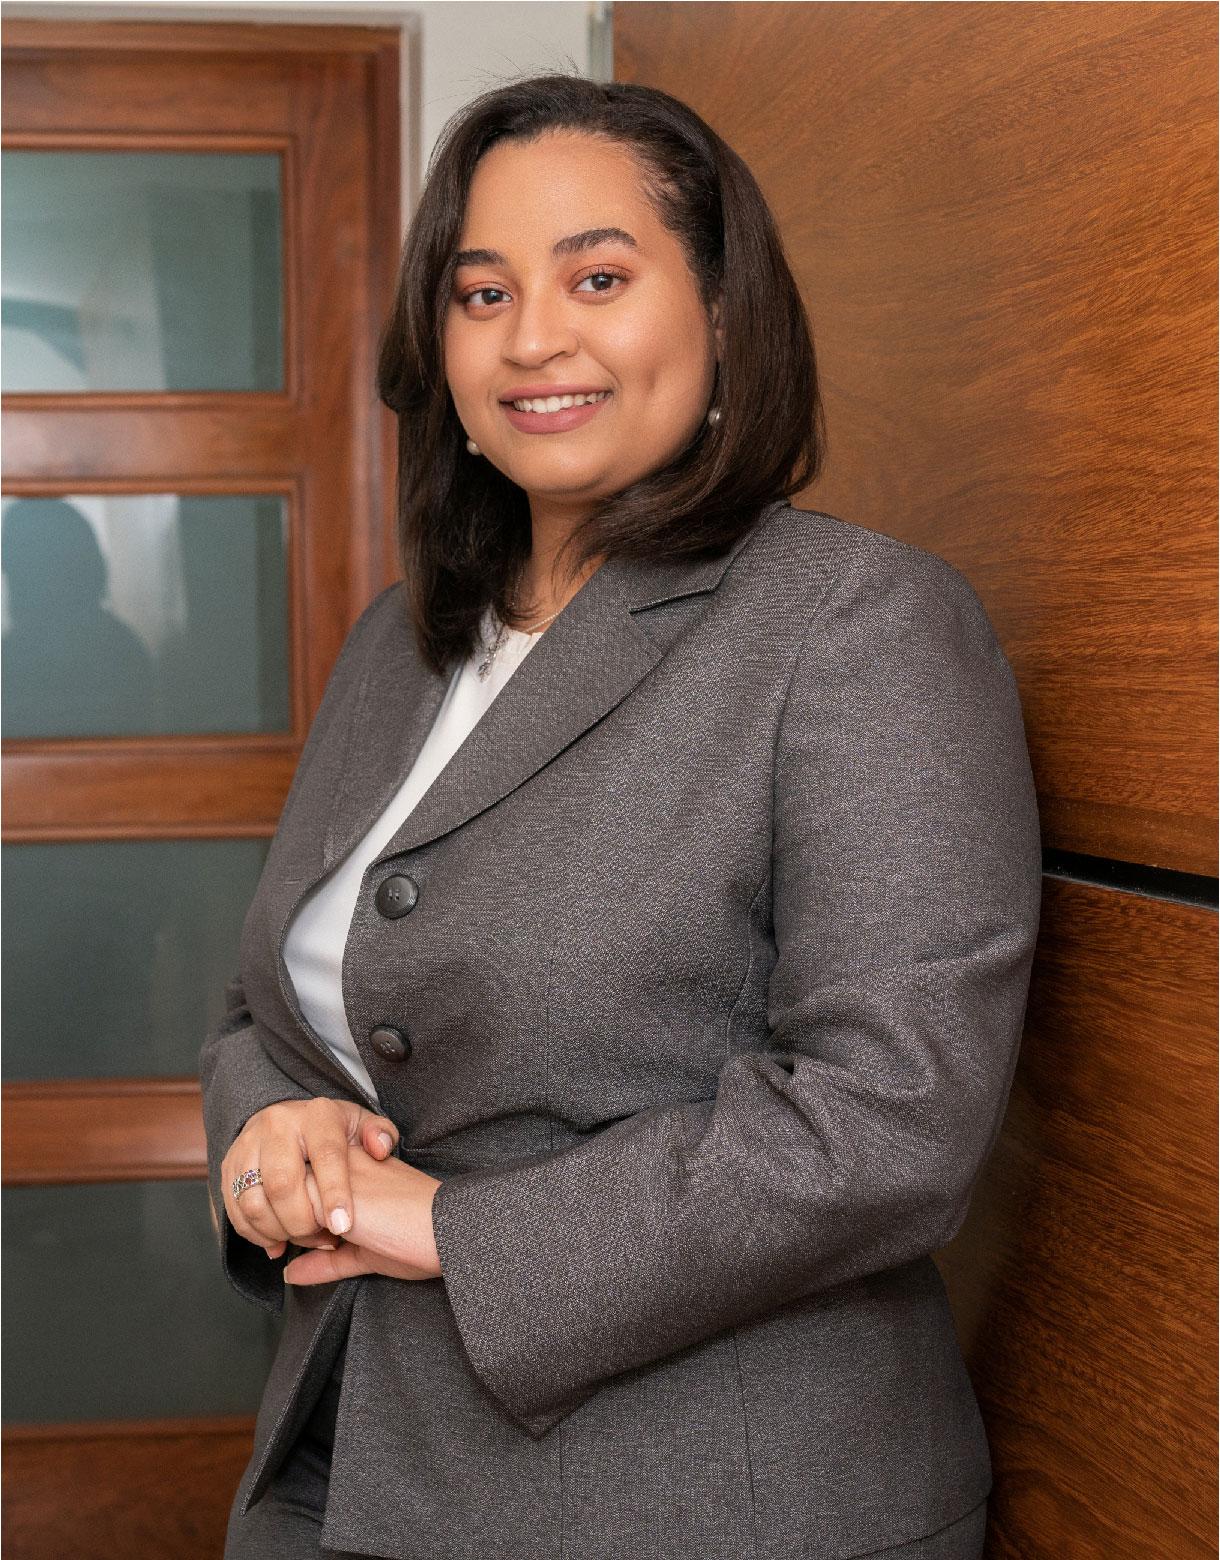 Nathalia Peña